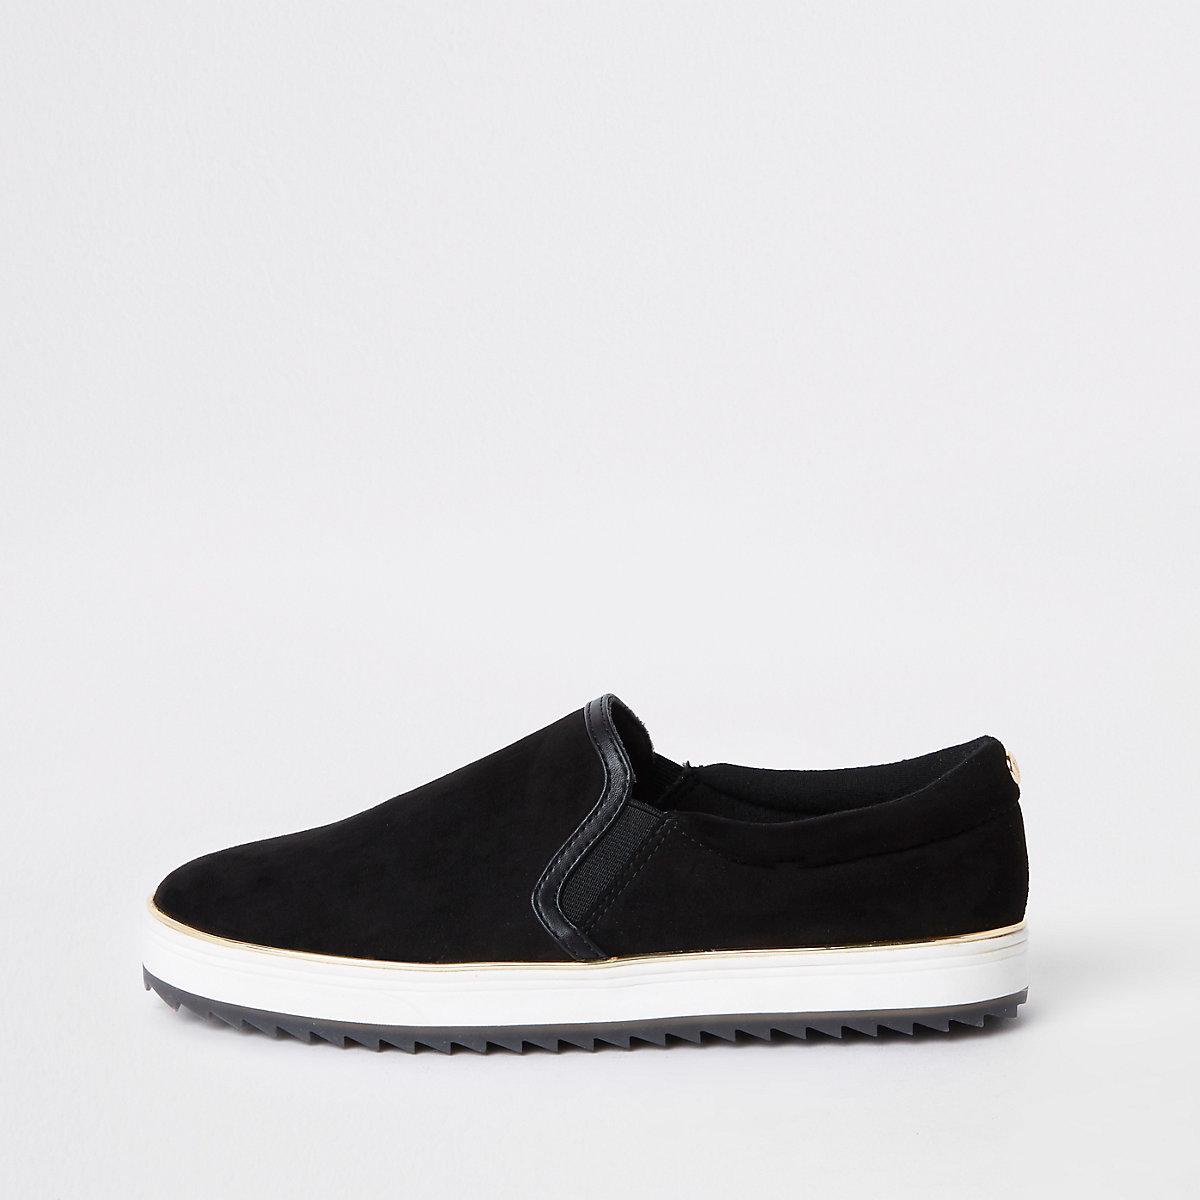 Black faux suede slip on plimsolls